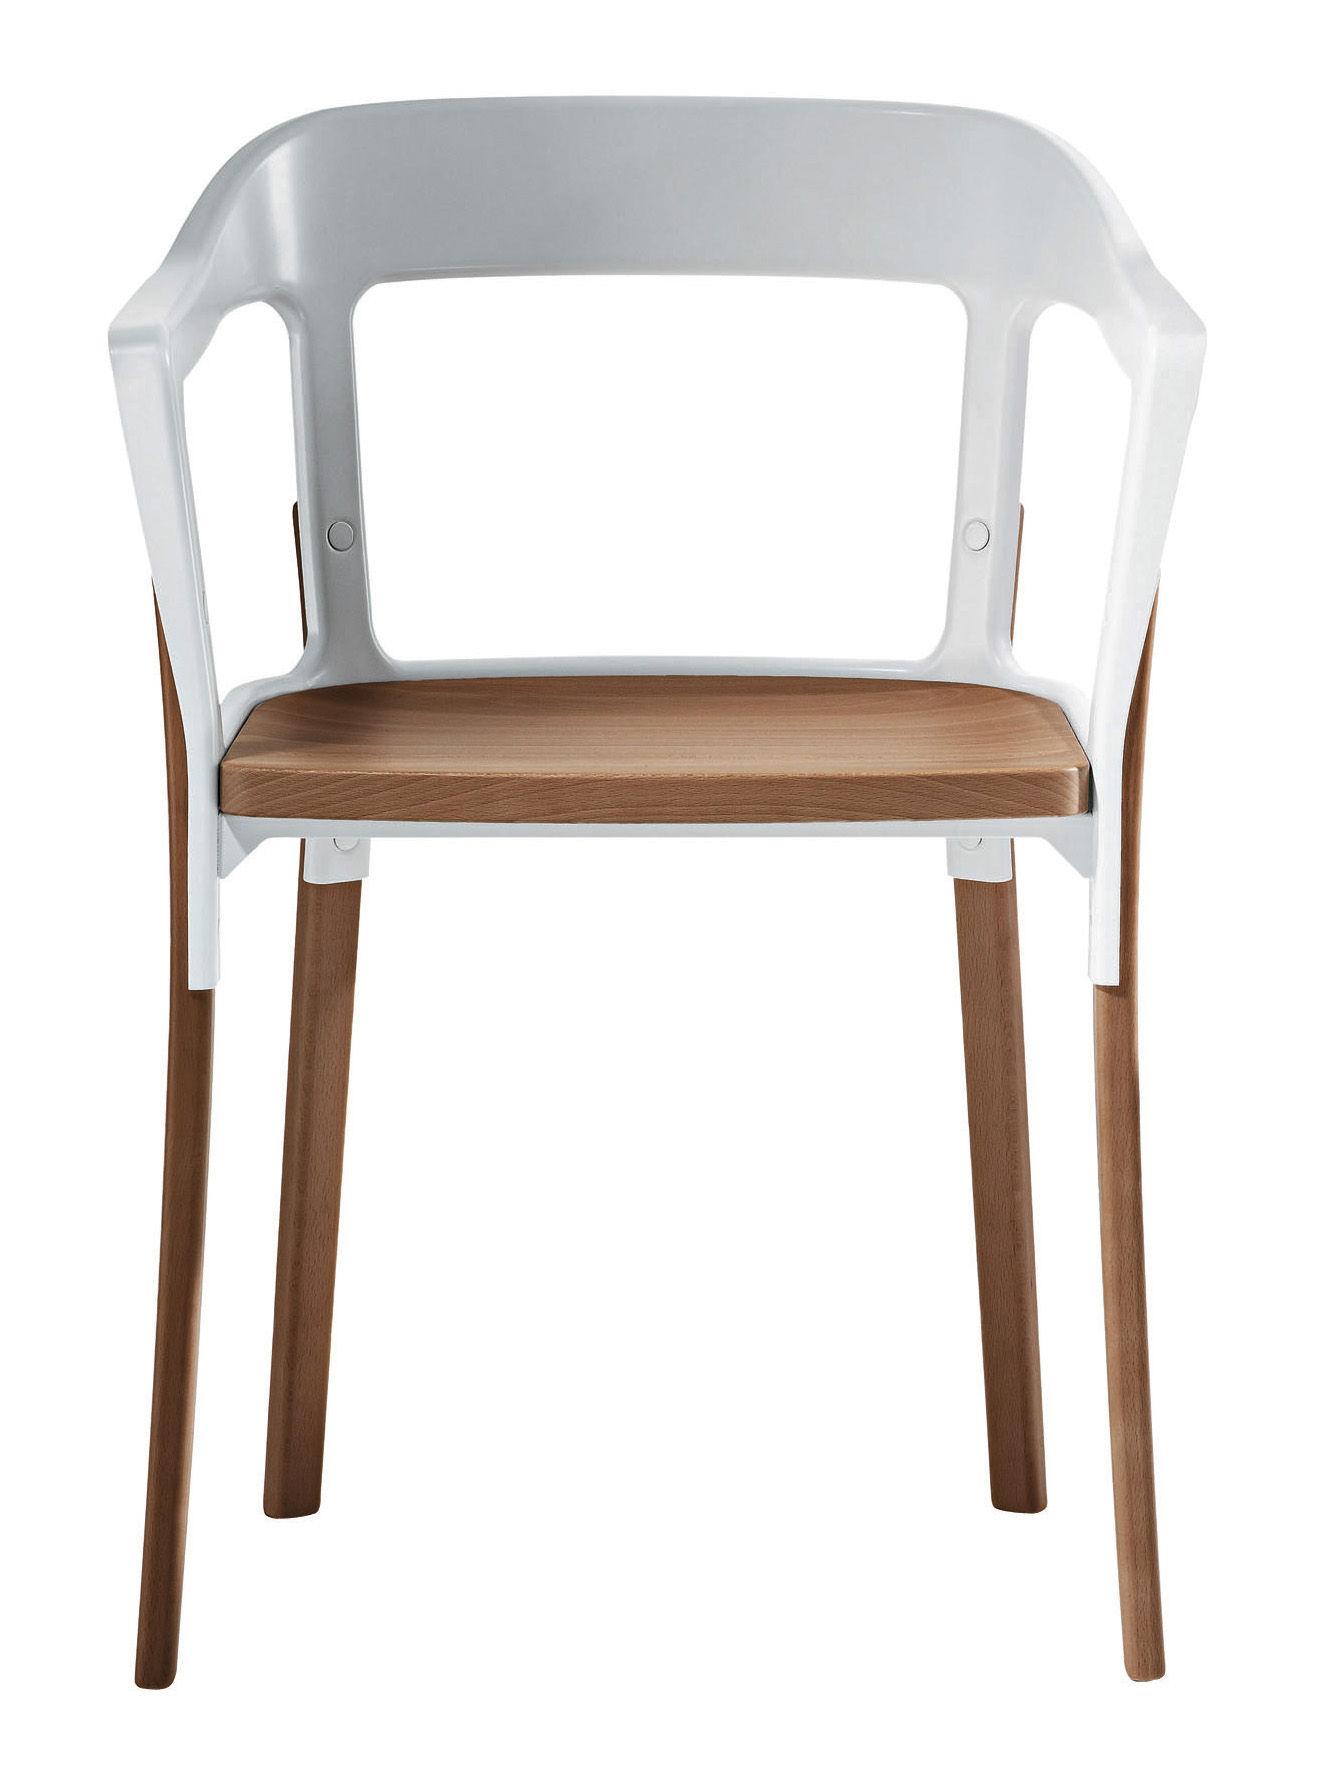 Furniture - Chairs - Steelwood Armchair - Wood & metal by Magis - White / Beech - Beechwood, Varnished steel